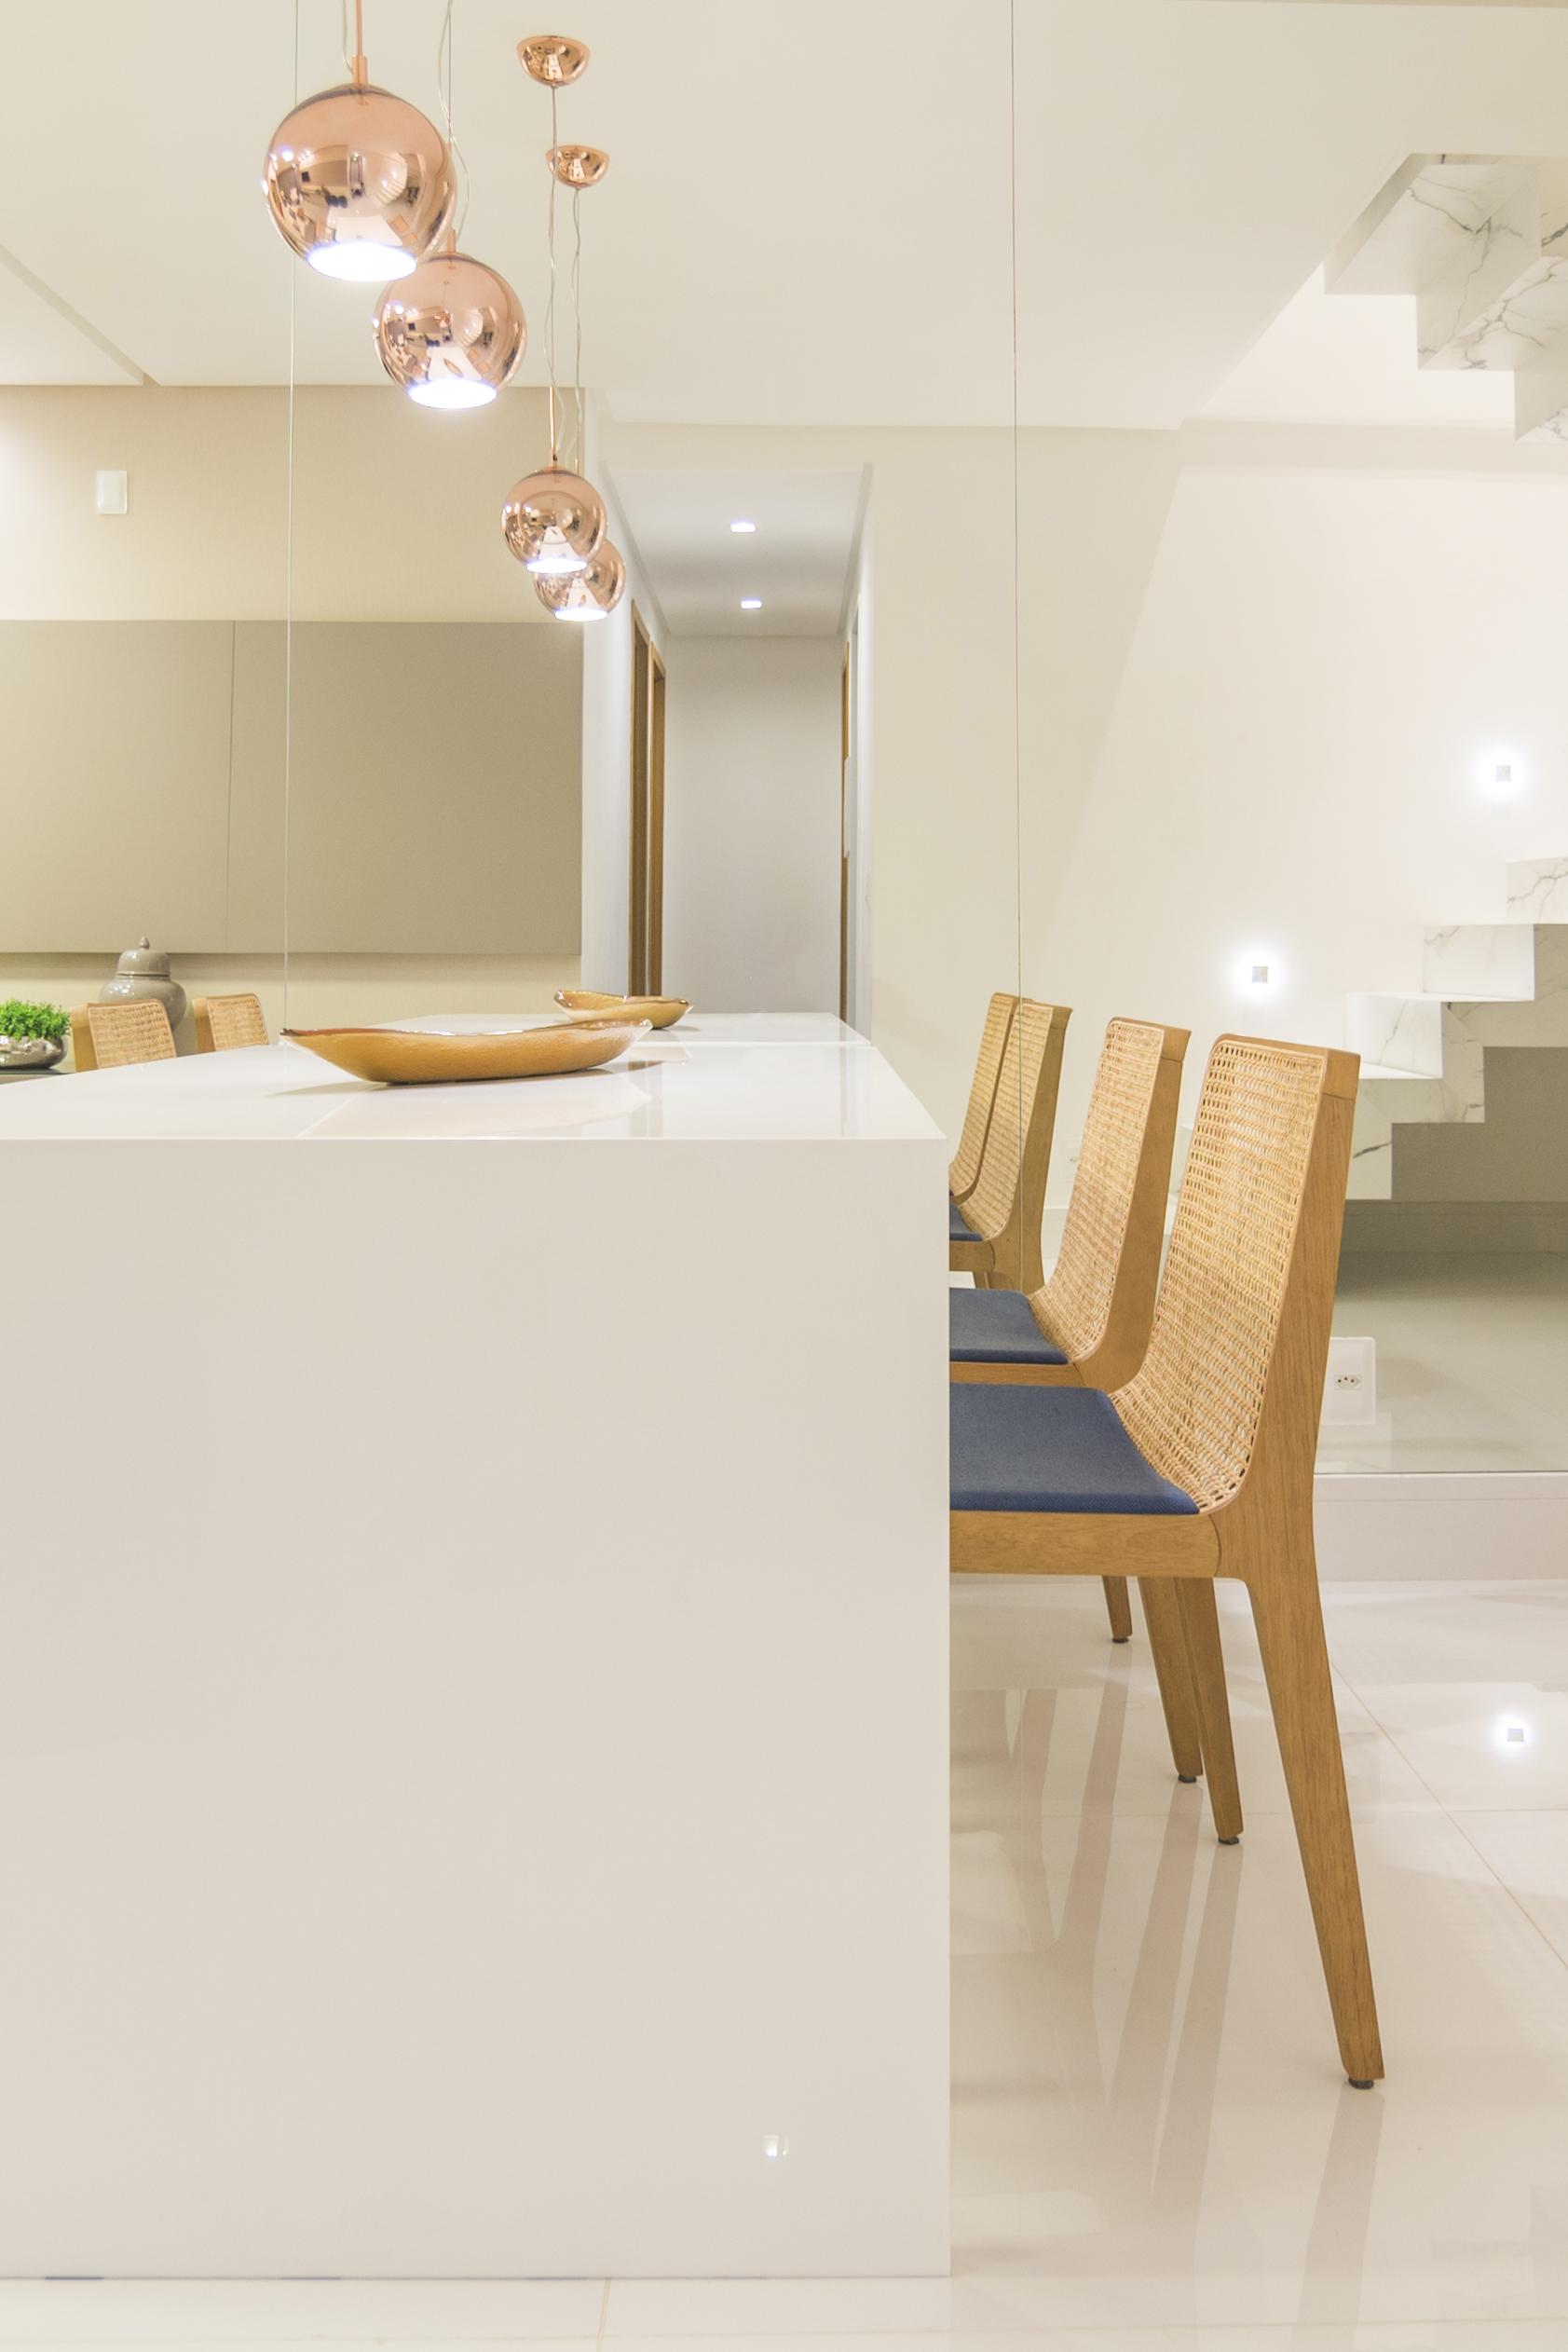 projeto-arquitetonico-robertoindira-duo-arquitetura-apartamentos-estar-03.jpg